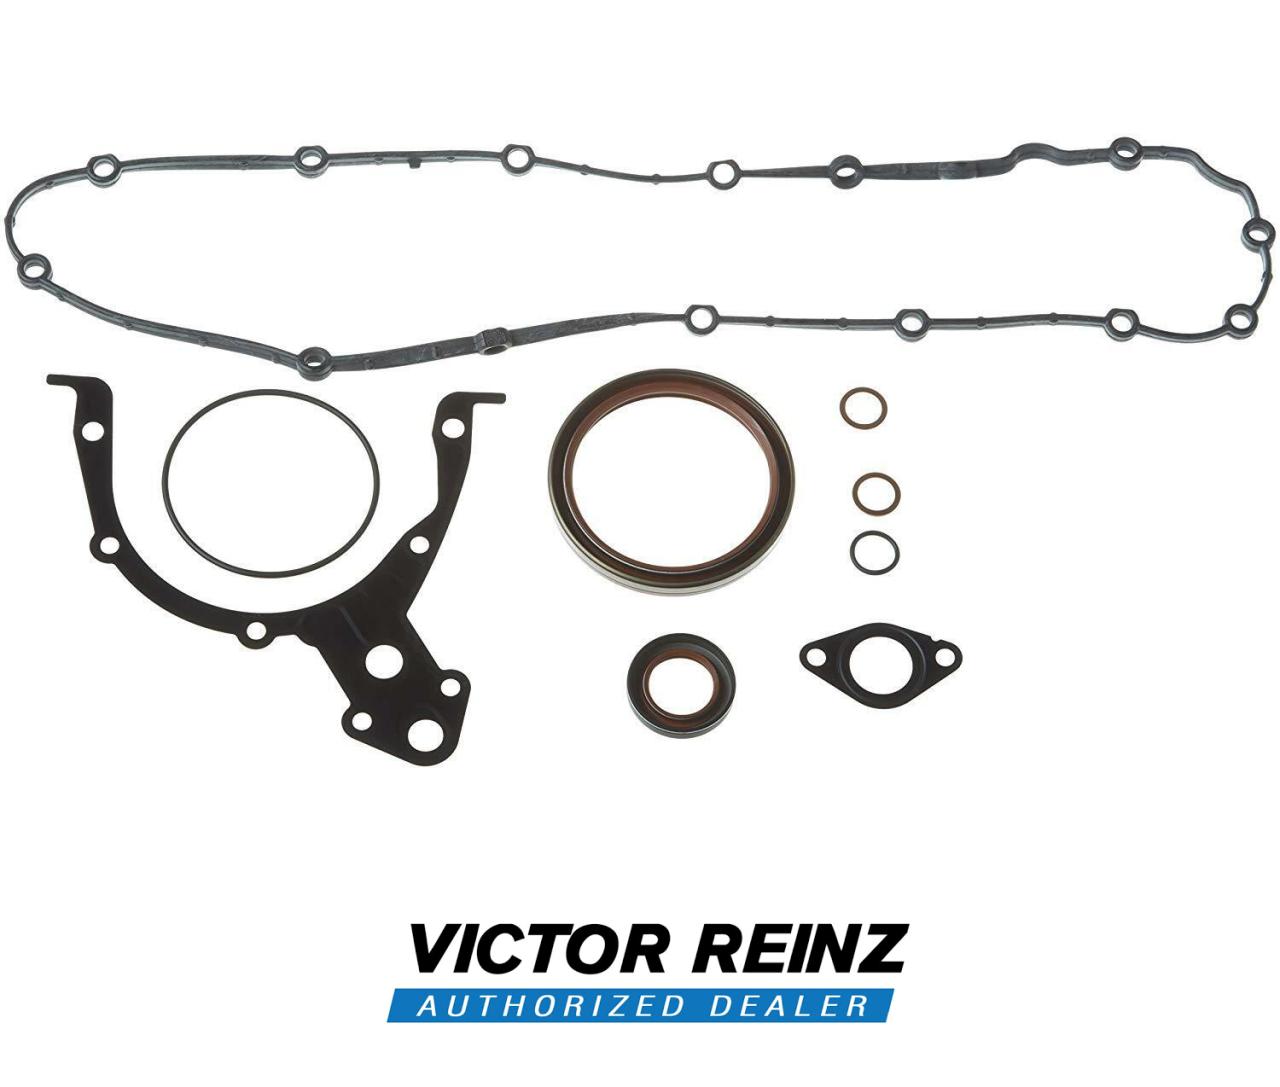 Opel Corsa B 1.4 16 Valf Alt Takım Conta Victor Reinz